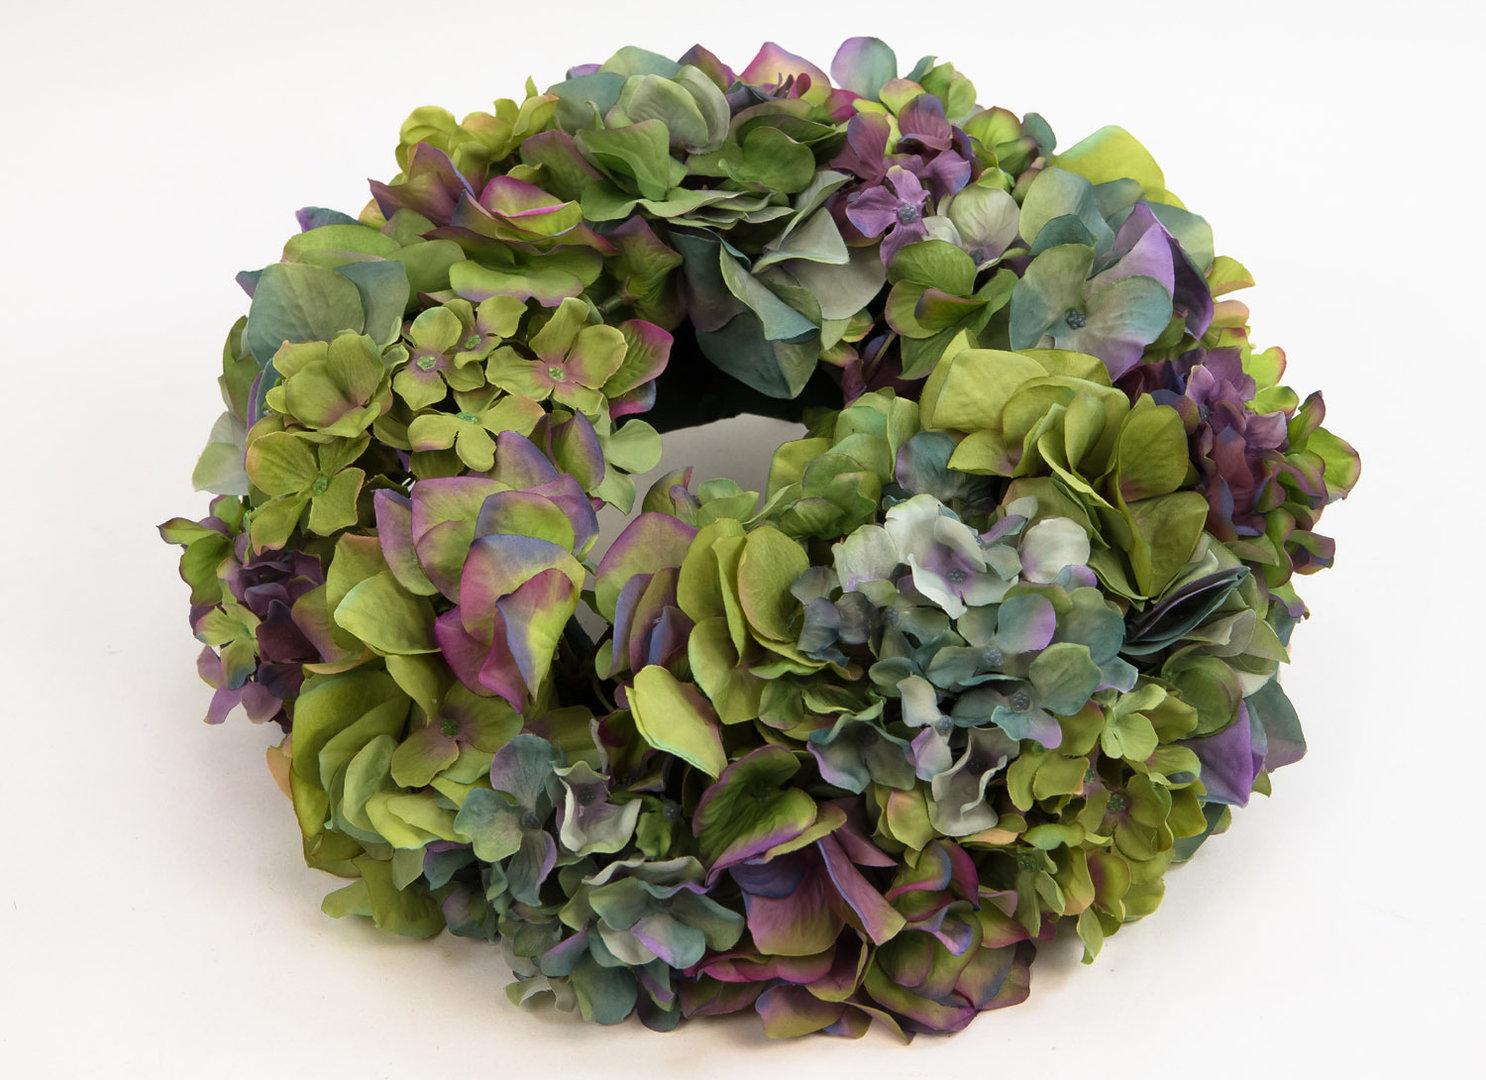 hortensienkranz 32cm blau gr n lila cg k nstlicher kranz k nstliche hortensien kr nze und. Black Bedroom Furniture Sets. Home Design Ideas